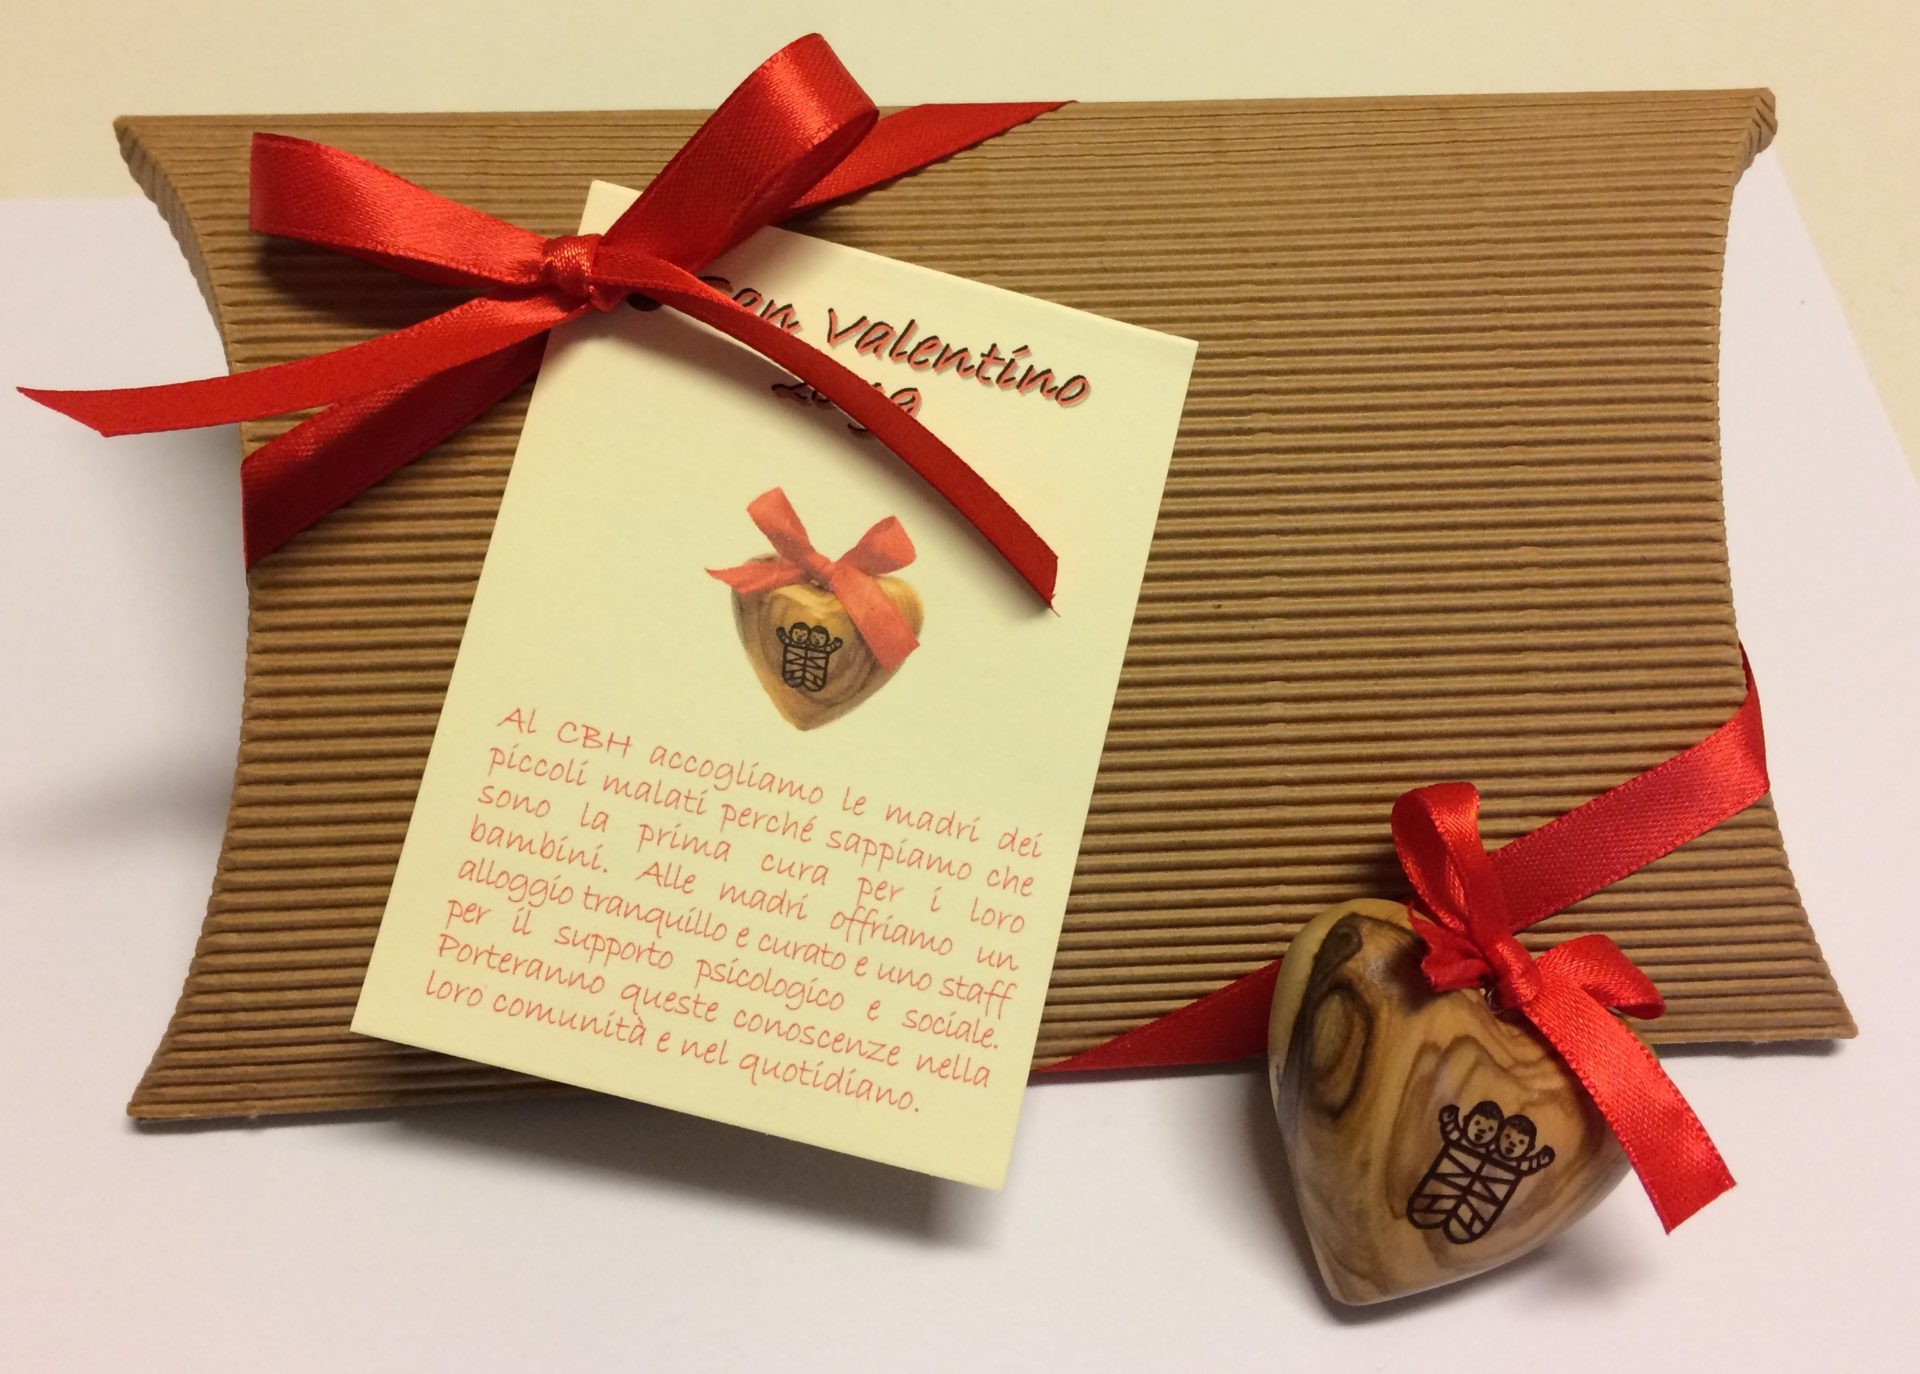 cuore san valentino aiuto bambino betlemme onlus